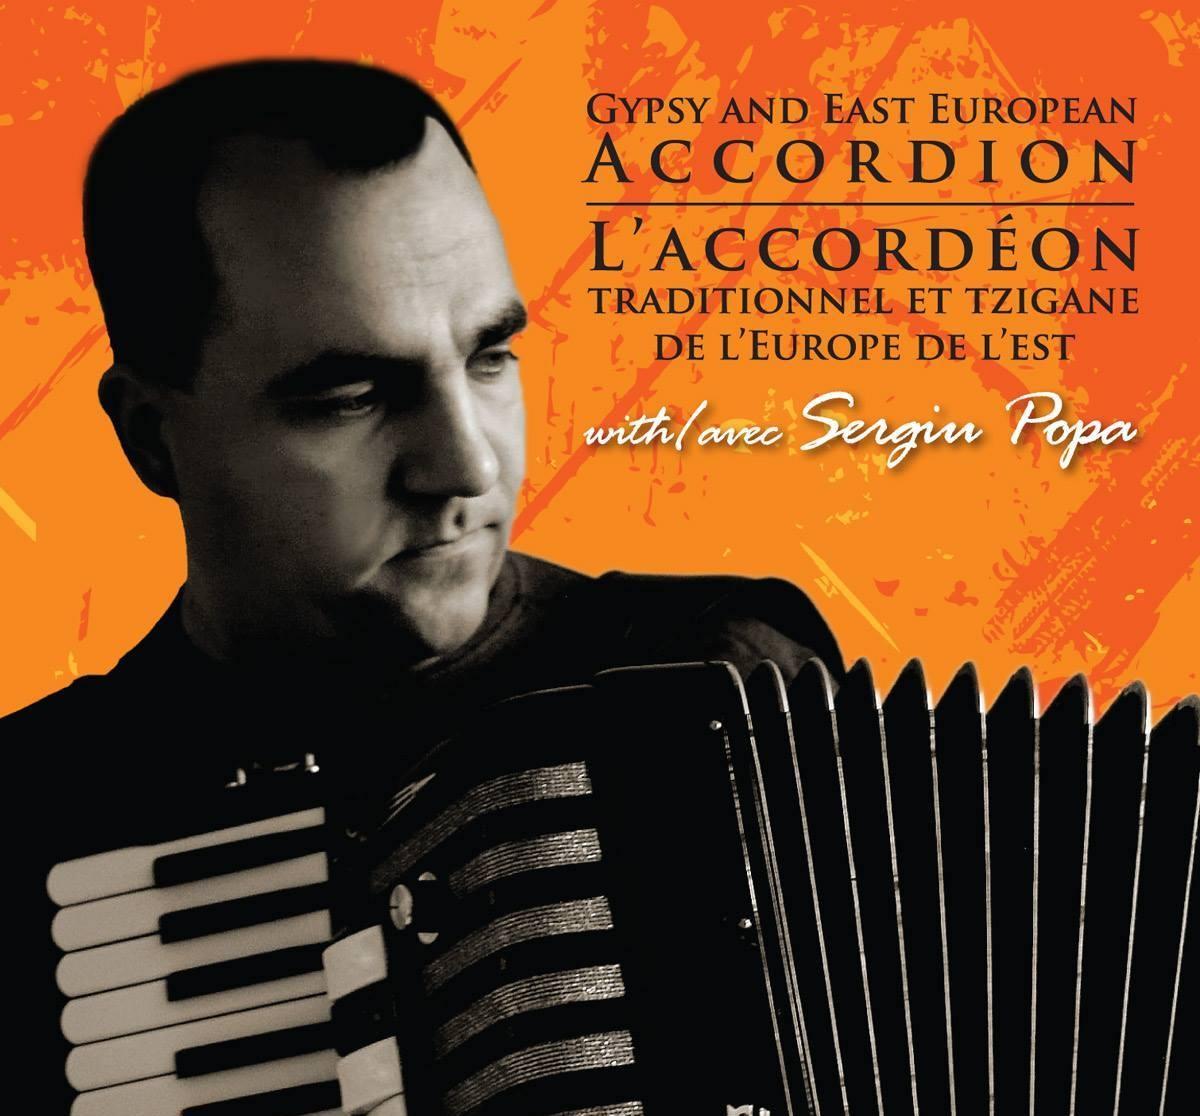 Gypsy and Eastern European Accordion with Sergiu Popa